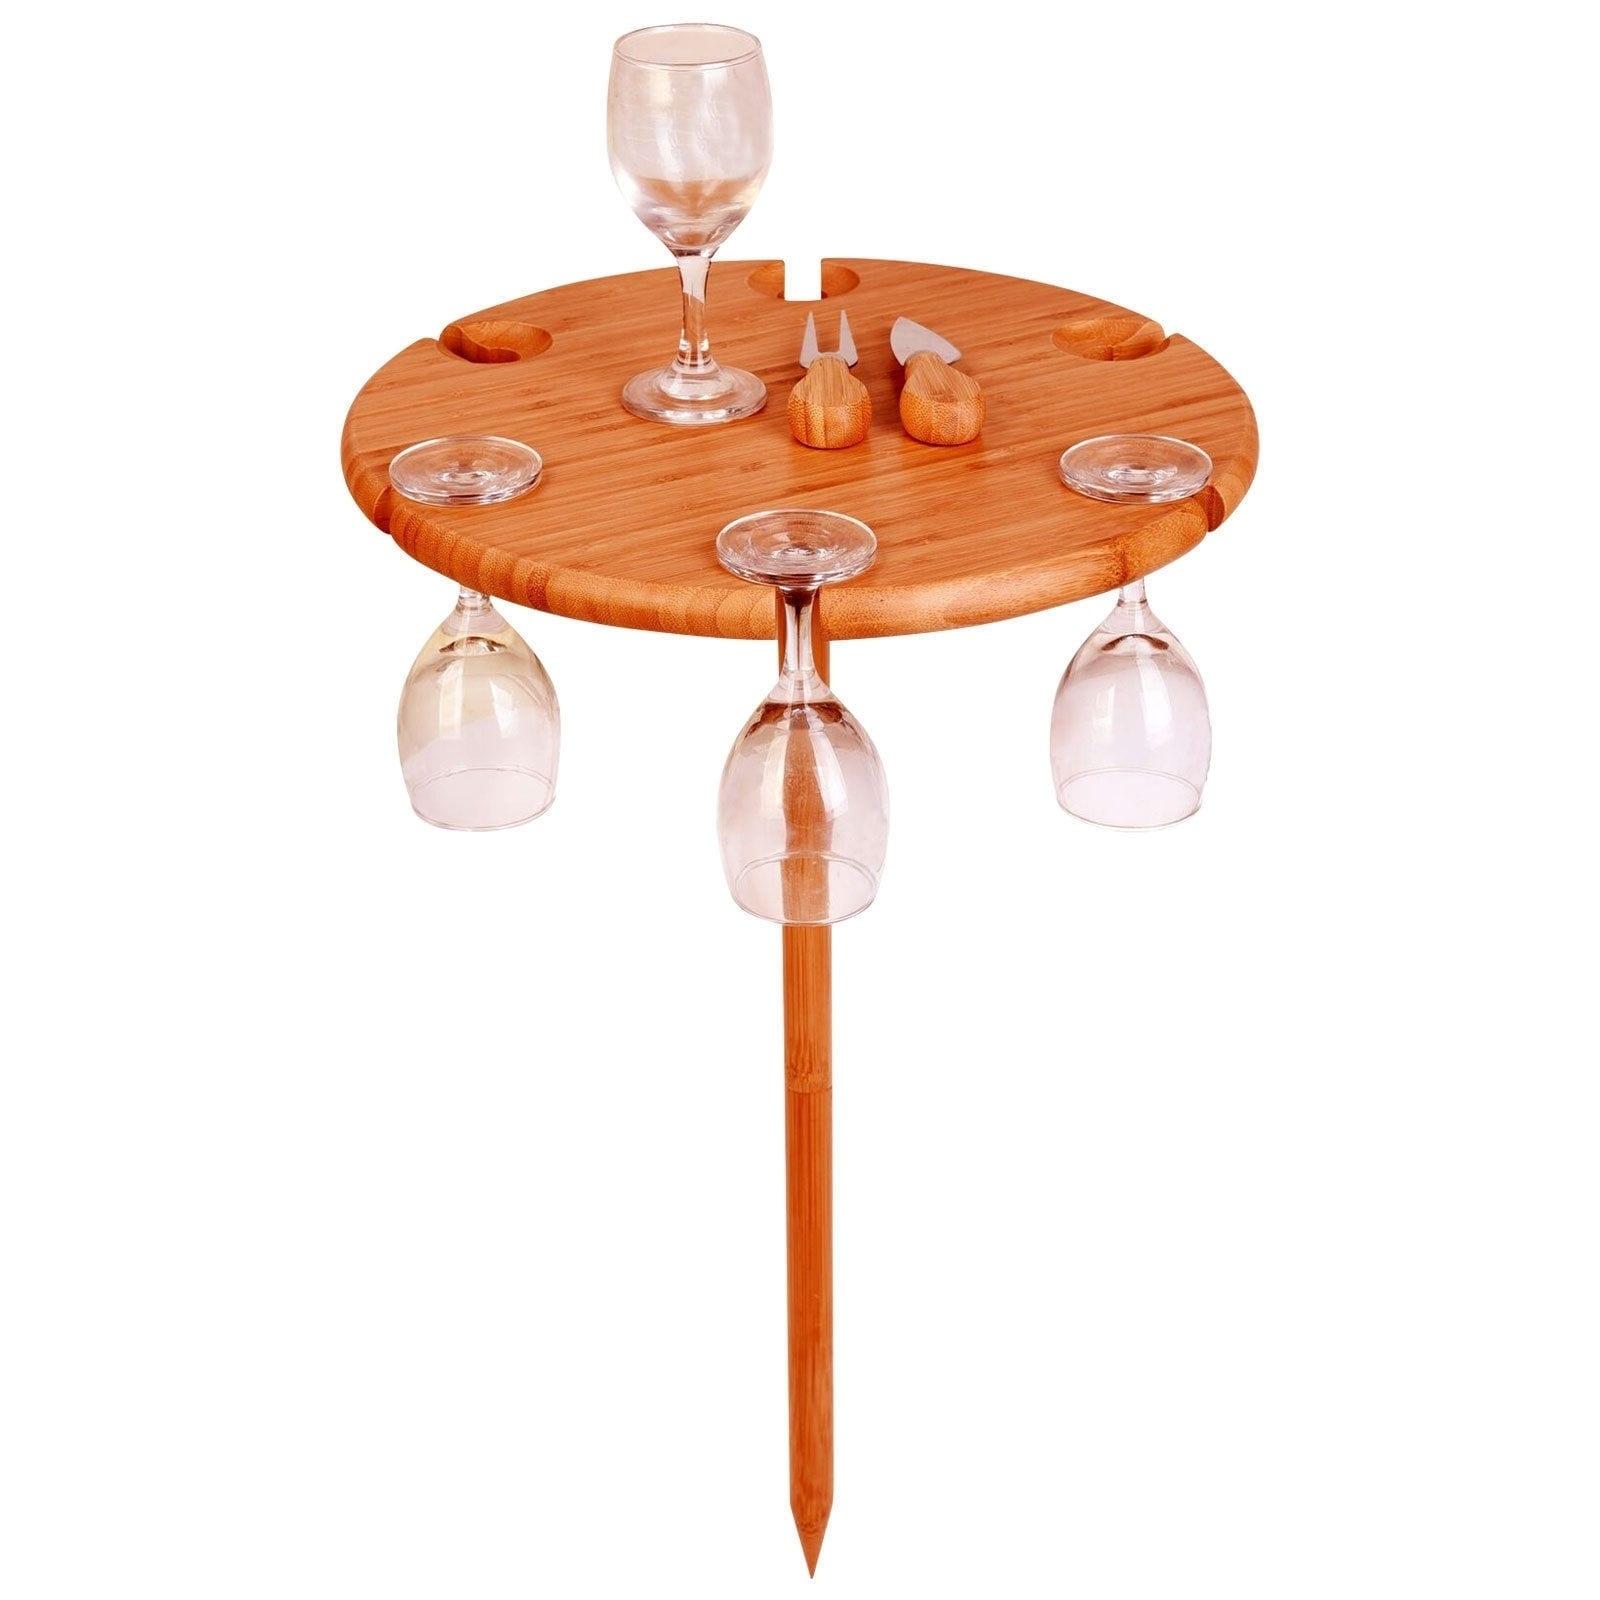 Shop Bambusi Portable Outdoor Picnic Wine Table Holder W Cutlery